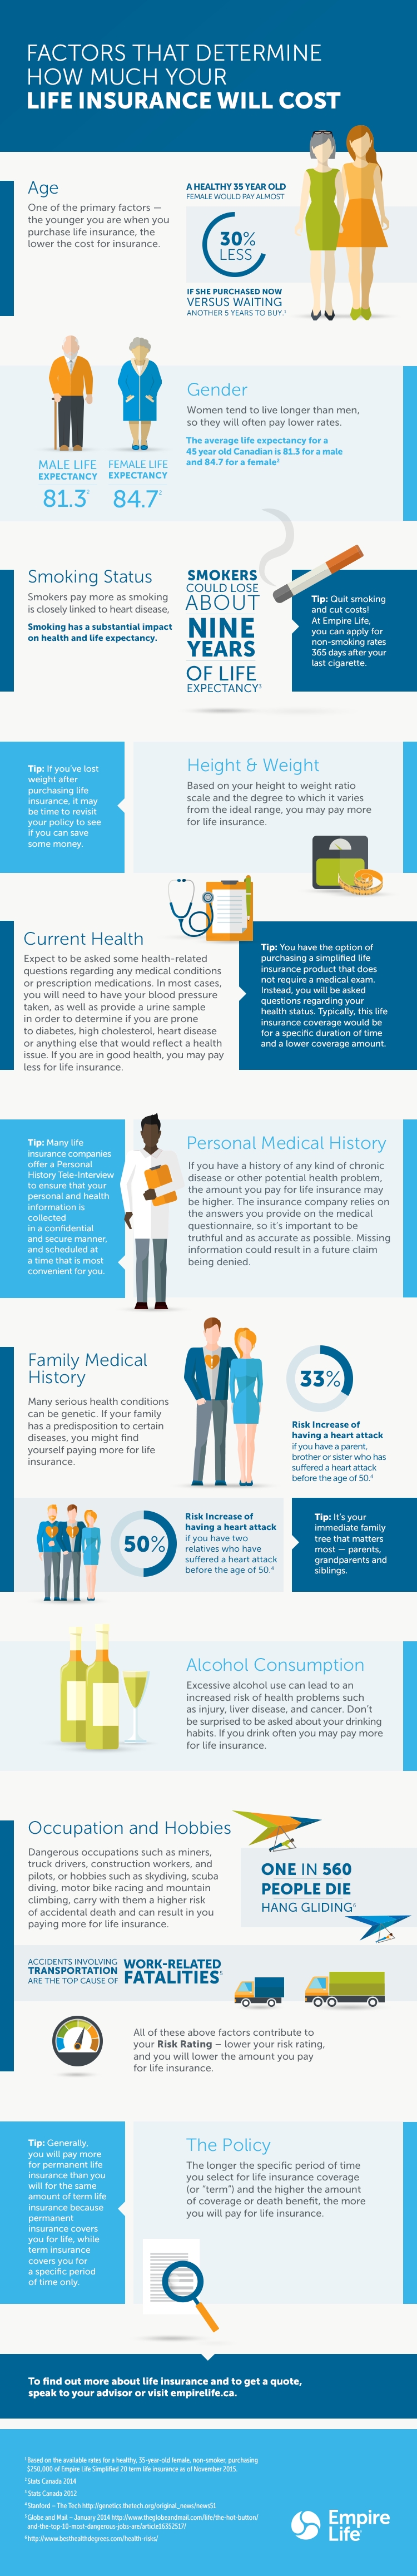 LifeInsuranceCostFactors-Infographic-2015-11-EN-F.png